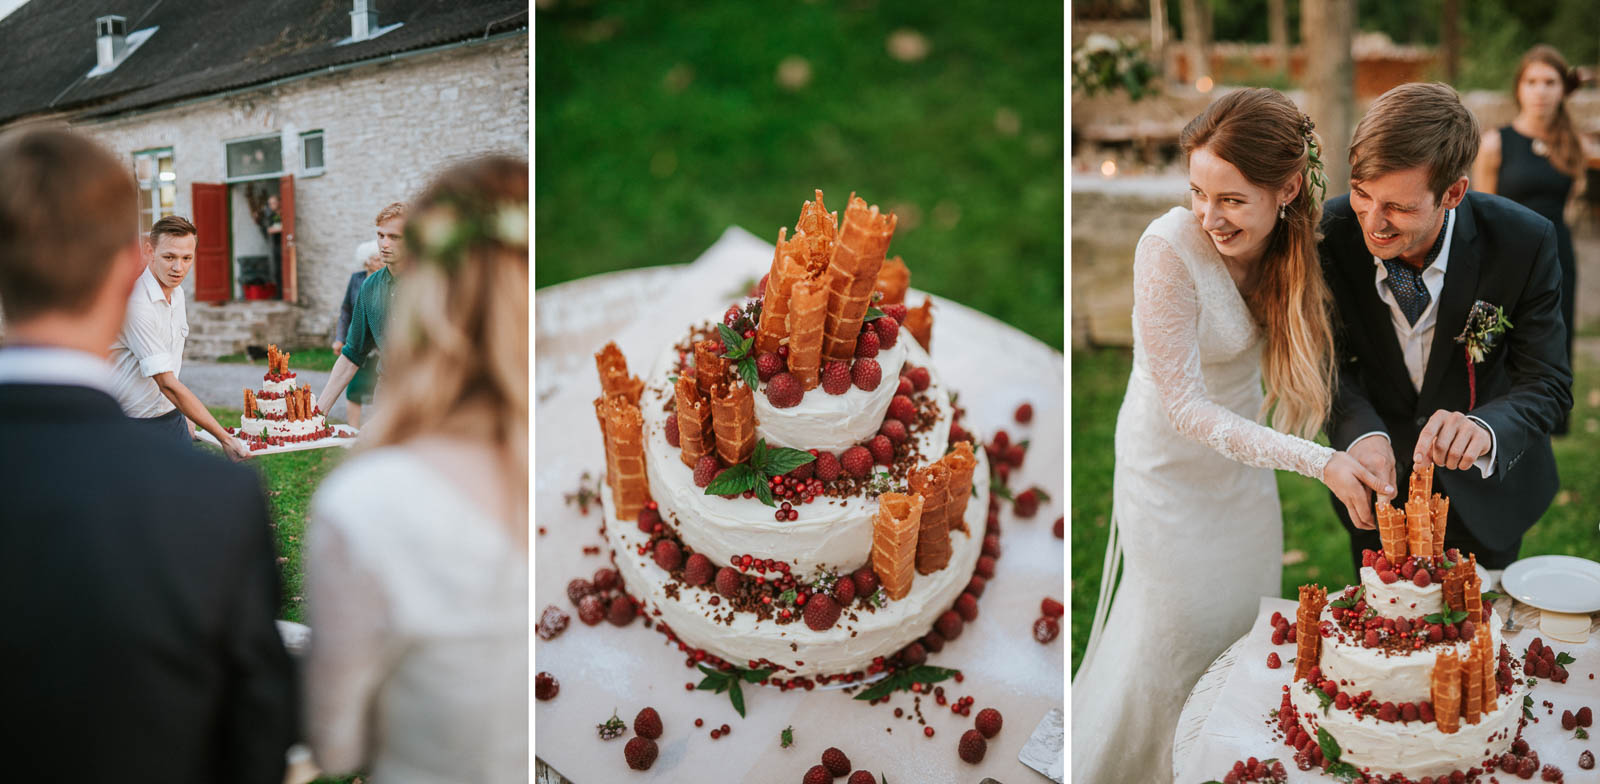 Pohjaka_mois_manor_pulm_wedding_Mait_Juriado-37